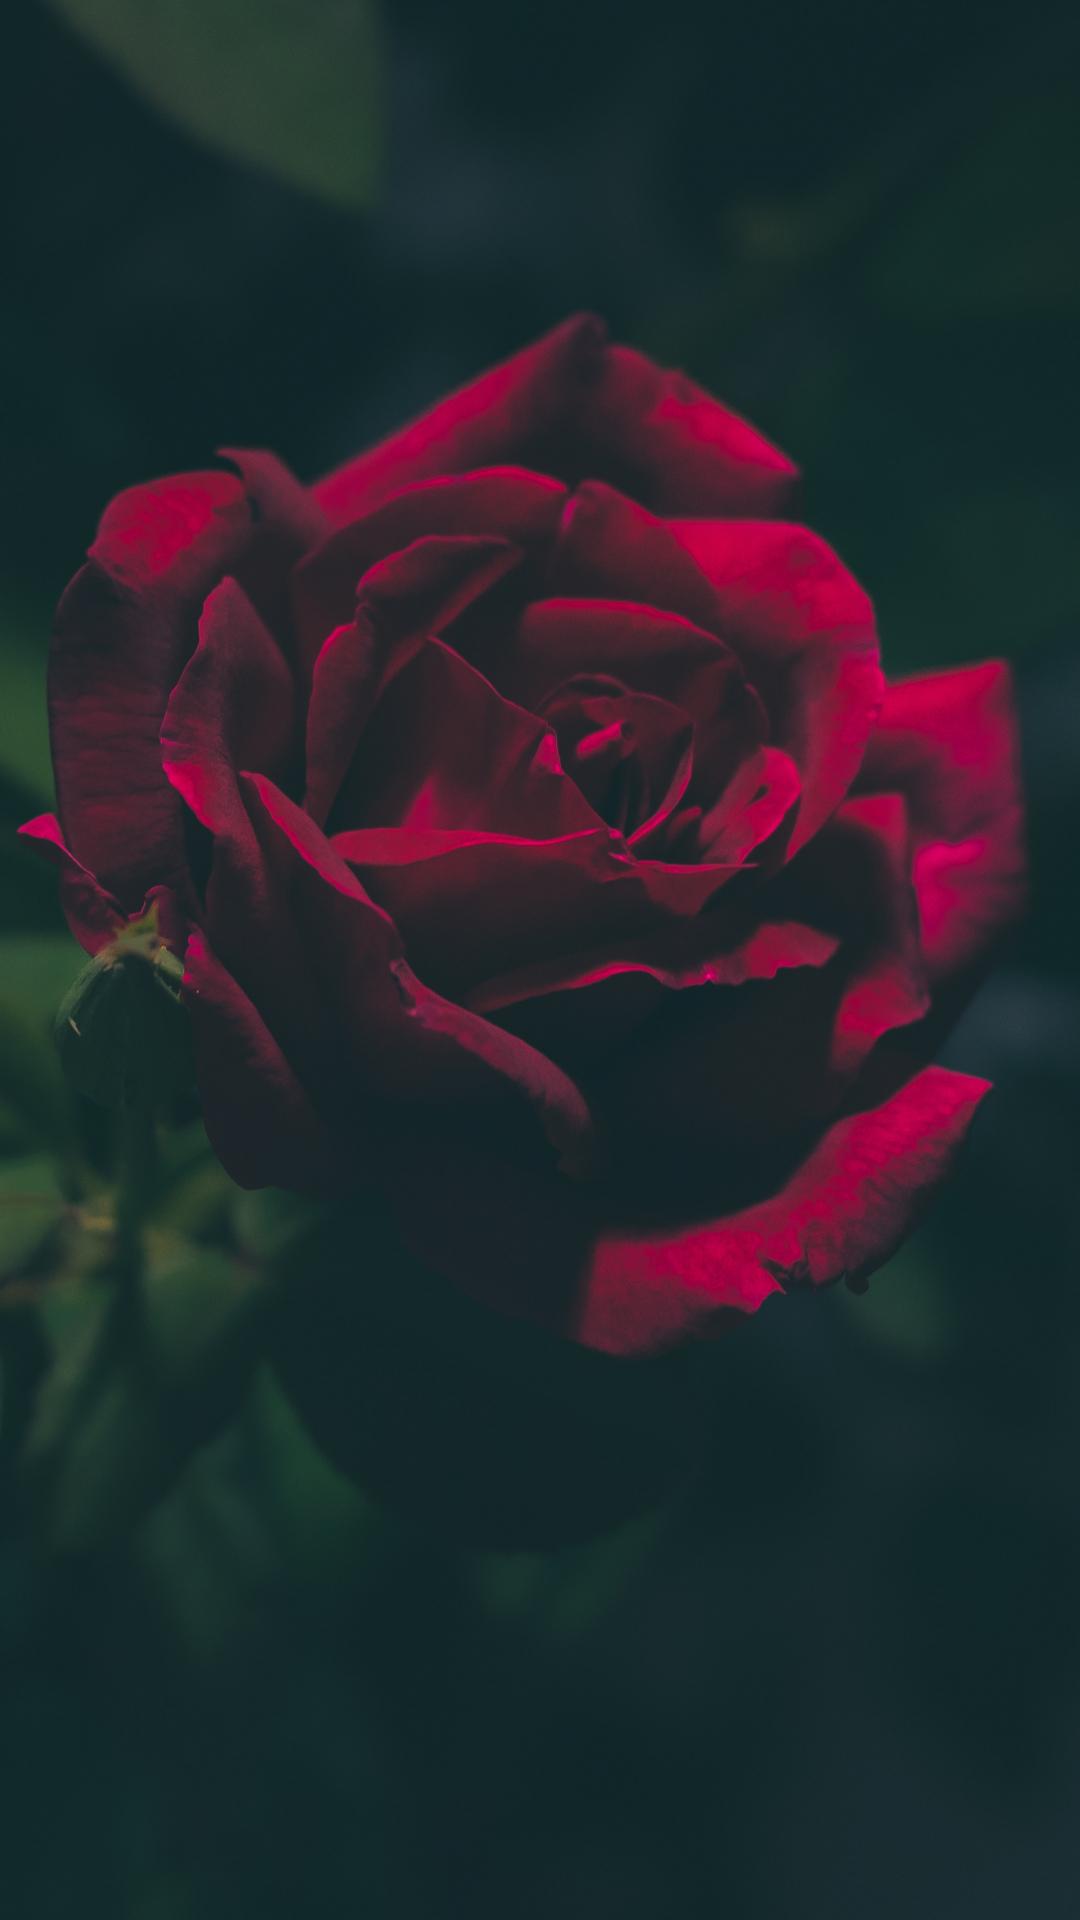 bloodred rose iphone wallpaper idrop news